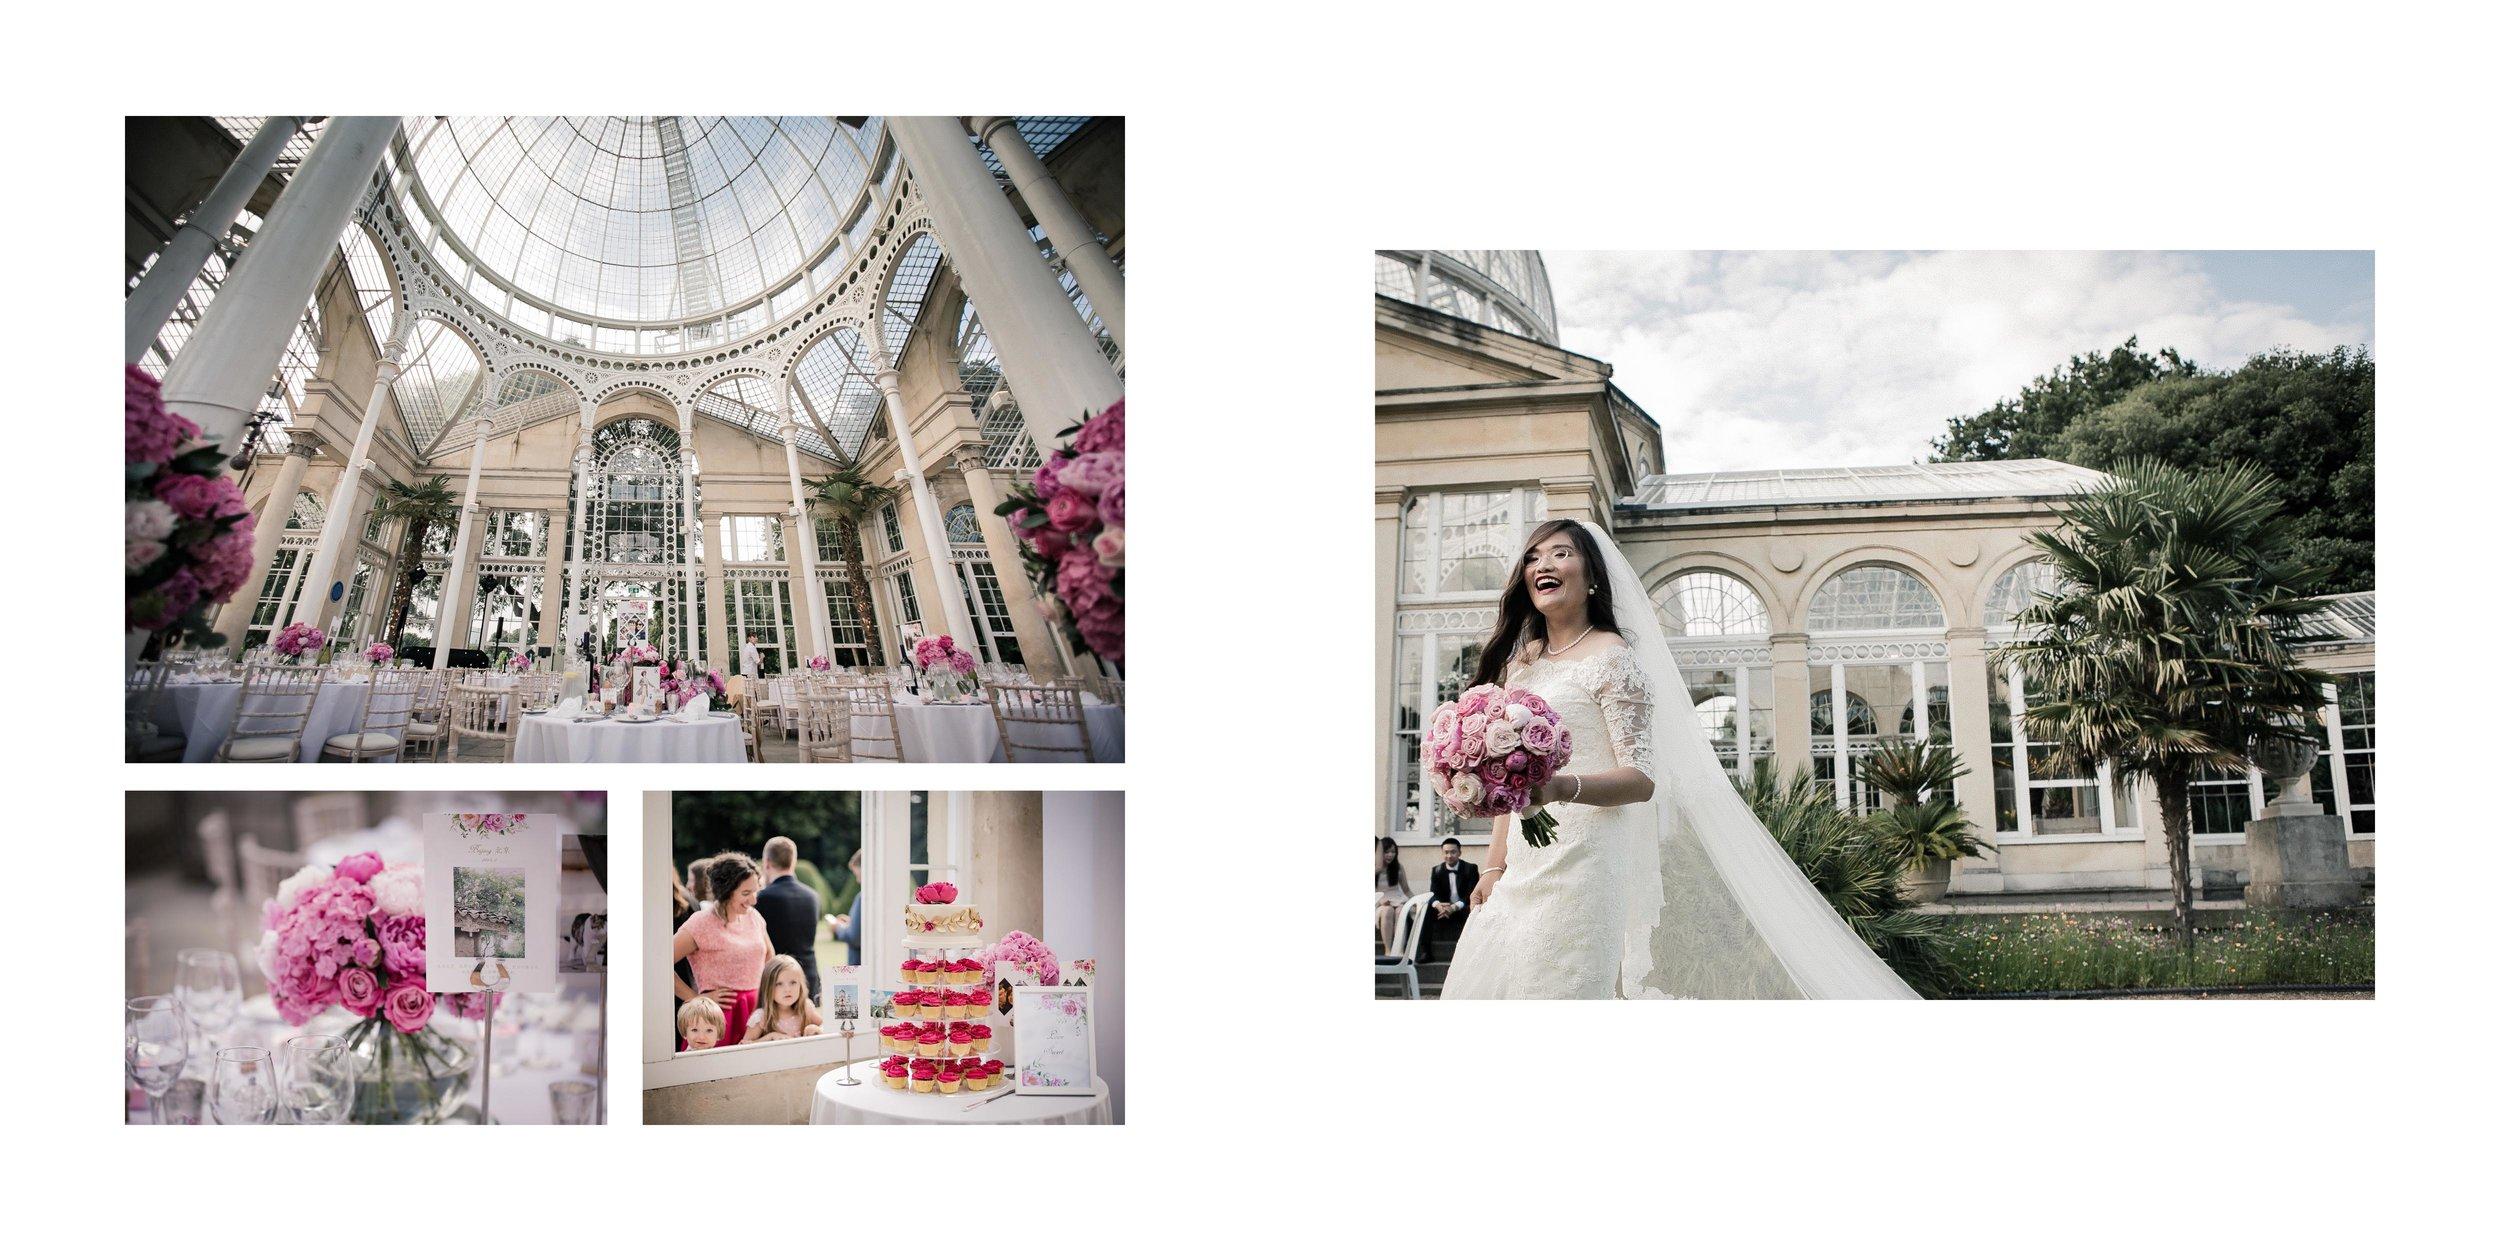 wedding_photographer_surrey_46.jpg